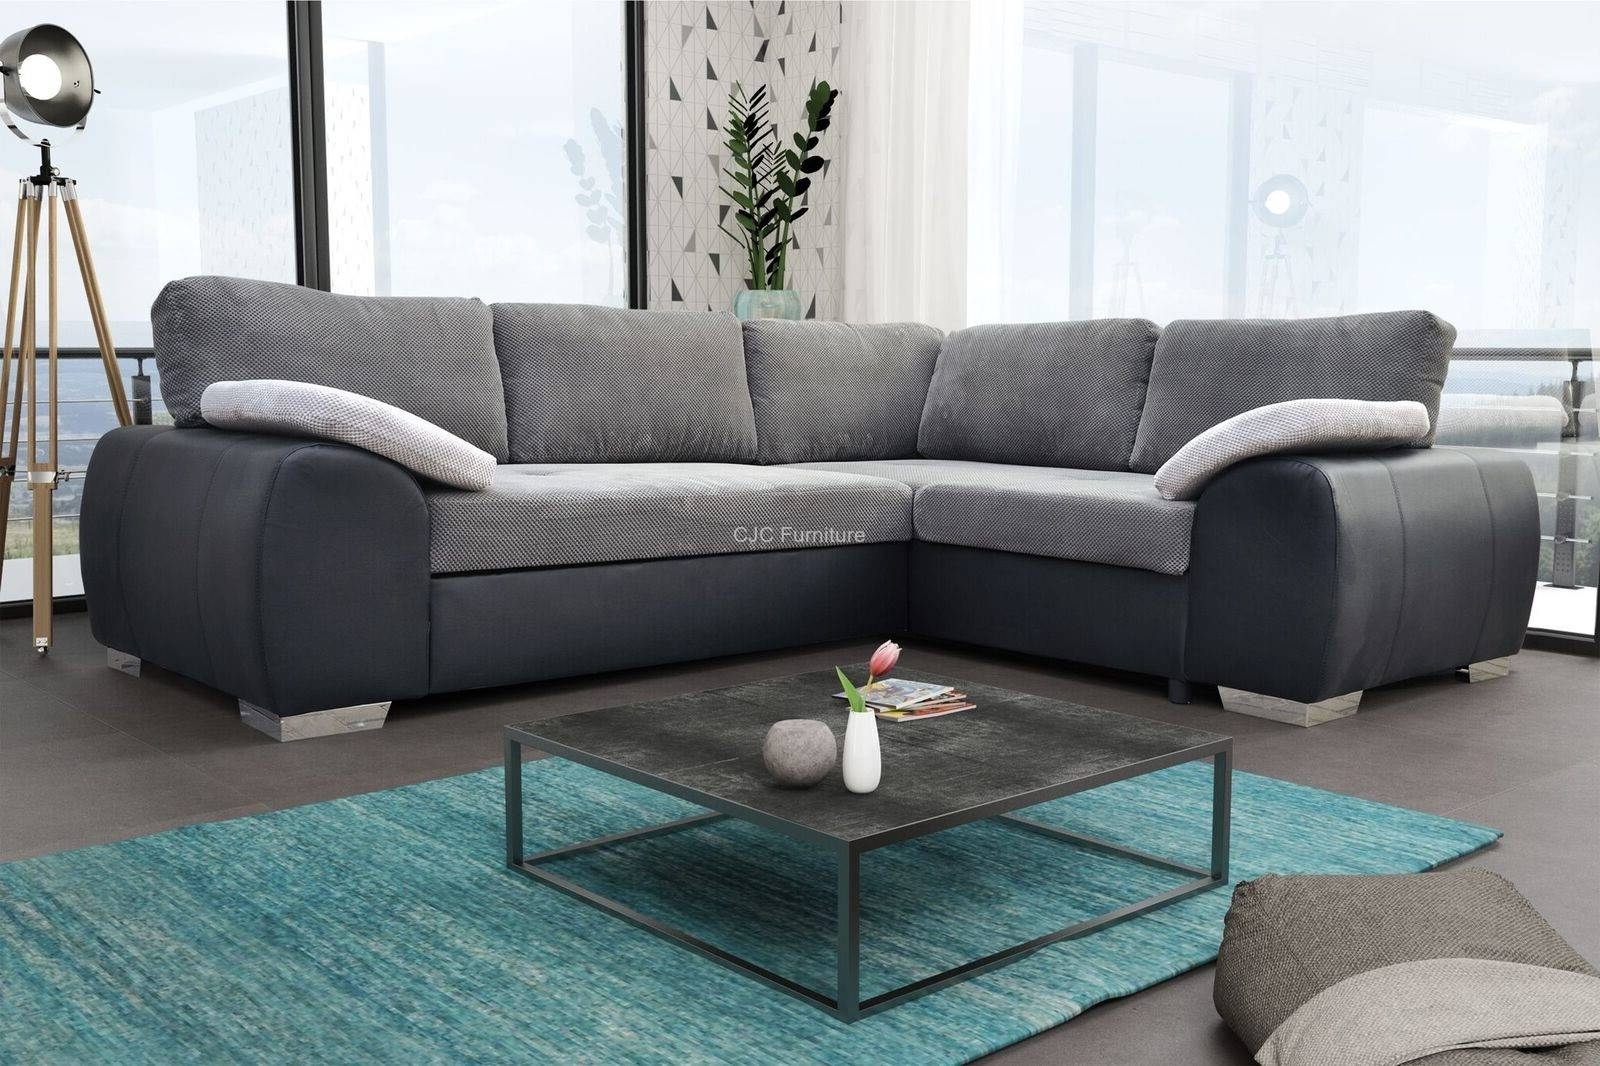 Birmingham Furniture - Cjcfurniture.co.uk Corner Sofa Beds with Fabric Corner Sofa Bed (Image 6 of 30)